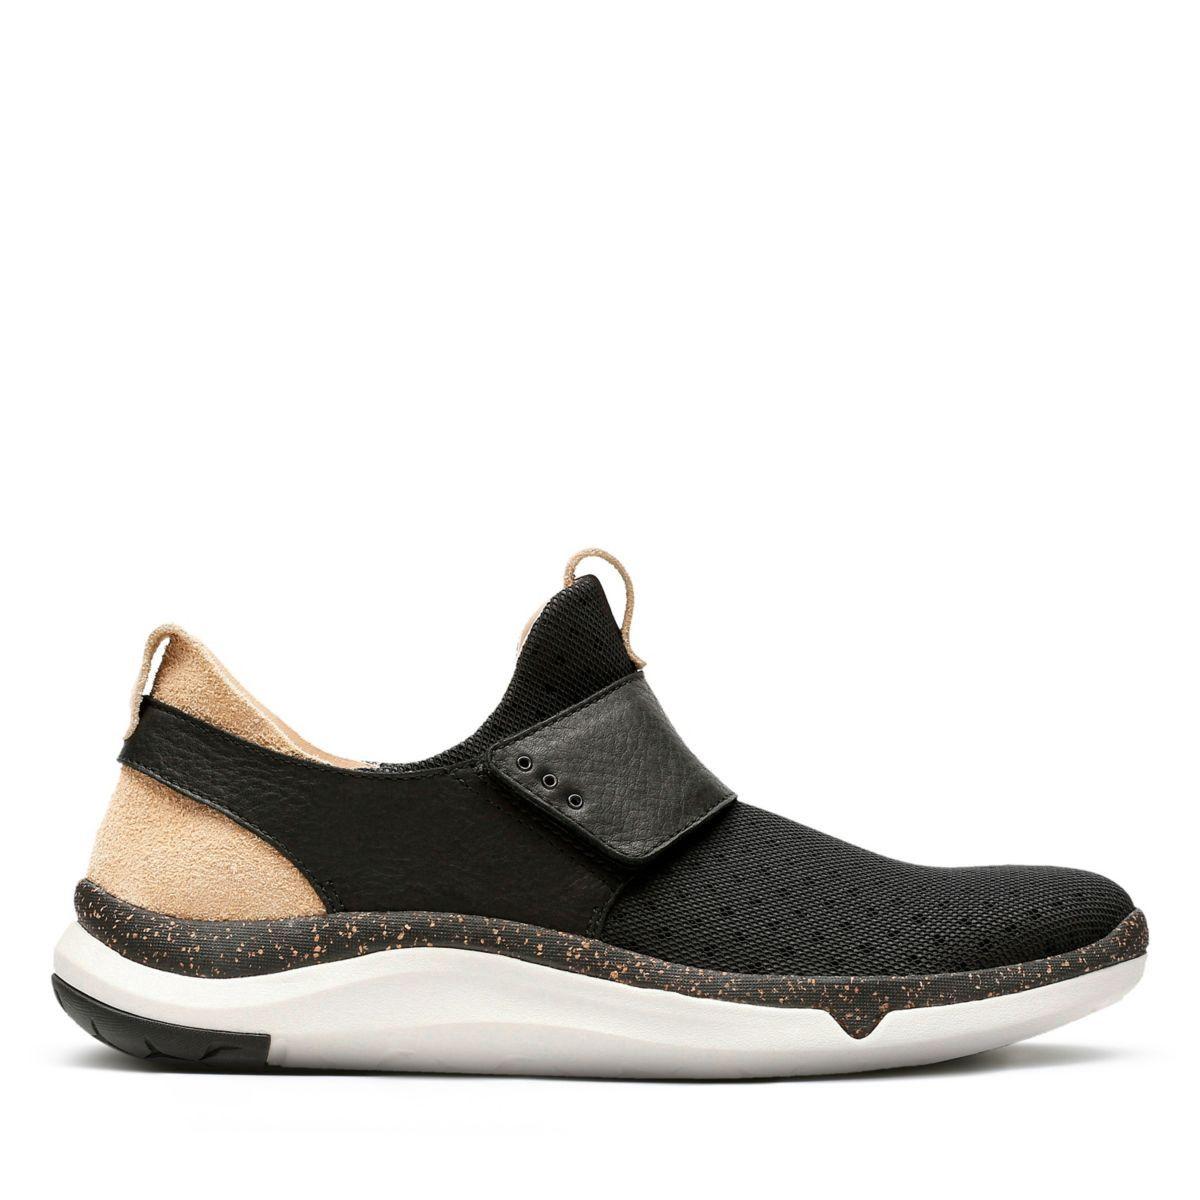 44eab6b9c8e6 Clarks Privo Flux - Mens Sport Shoes Black 10.5